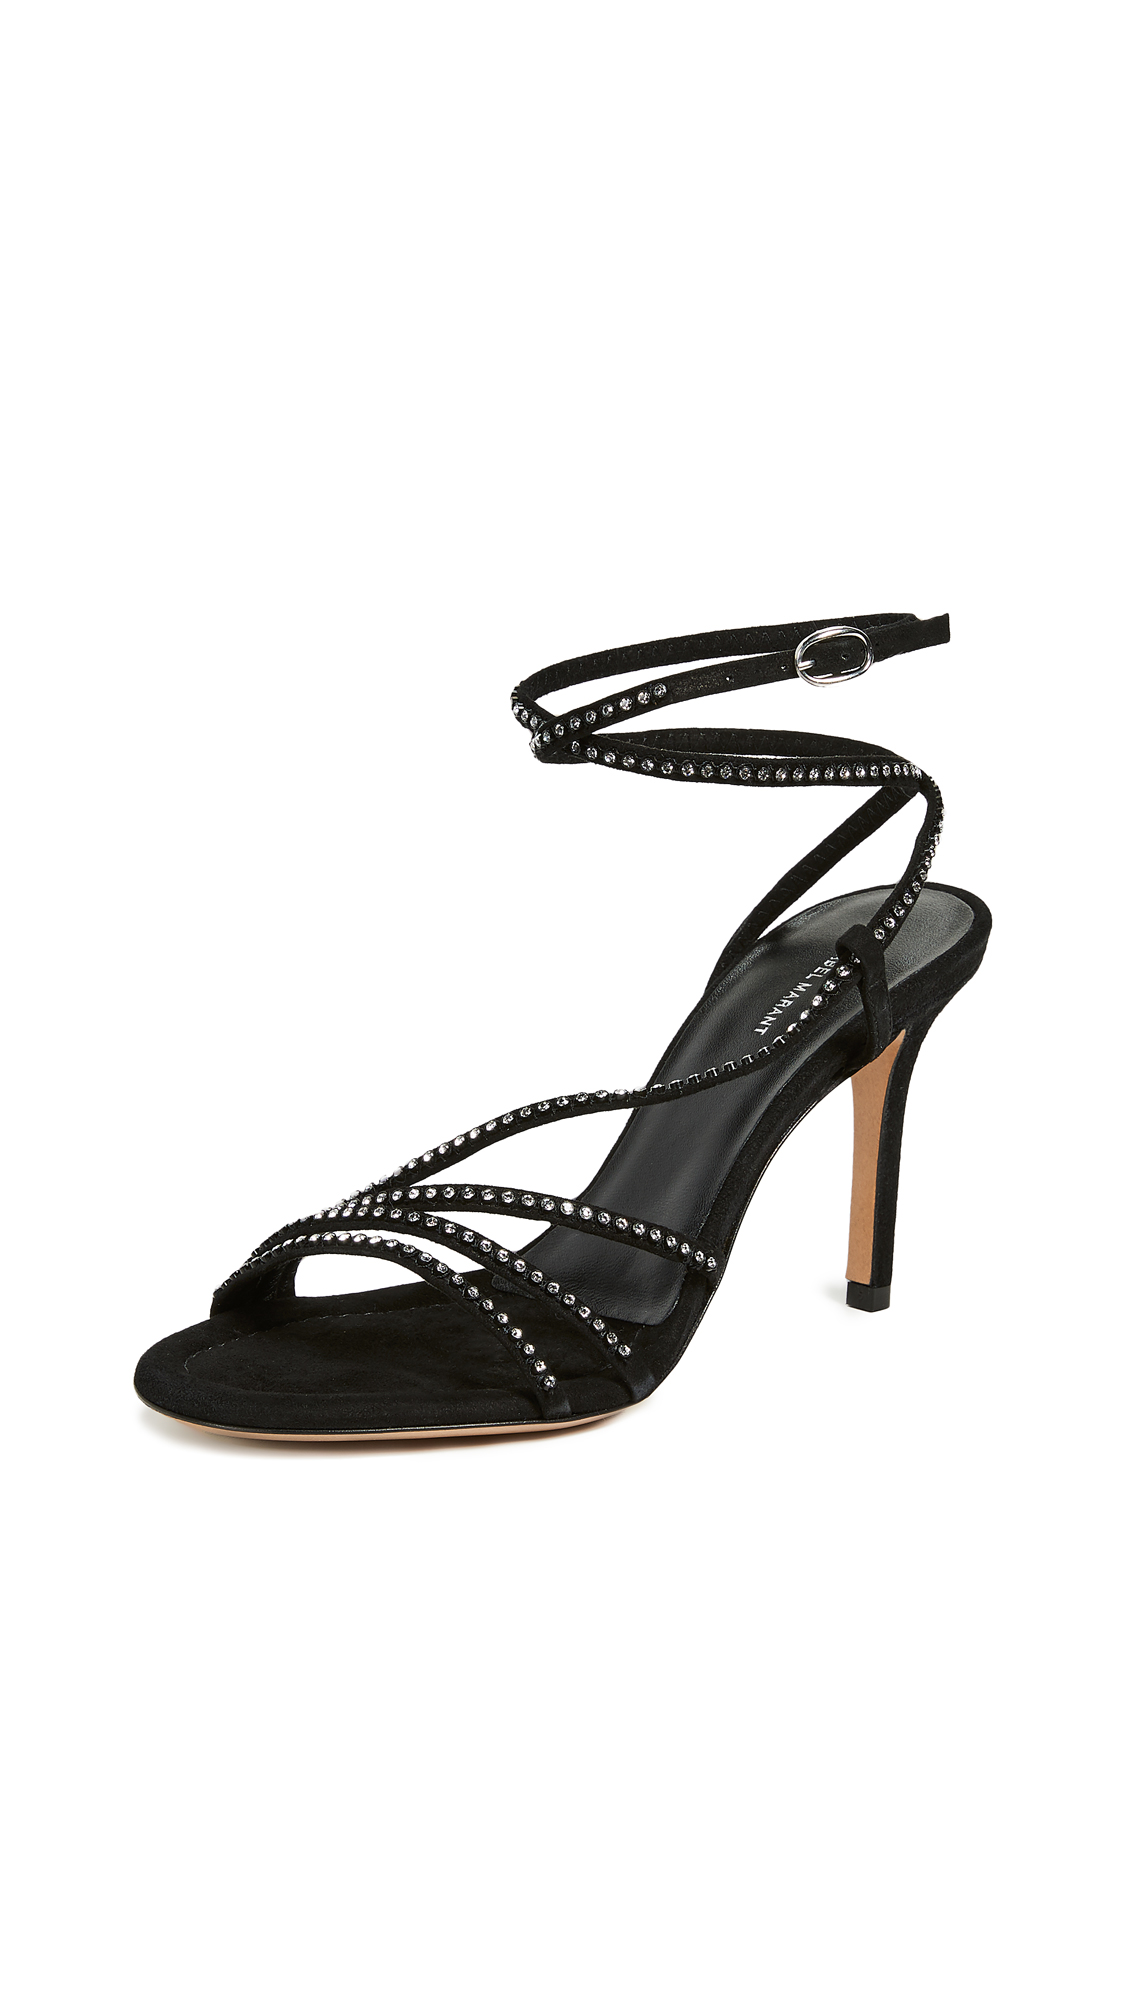 Isabel Marant Amspee Sandals - Black